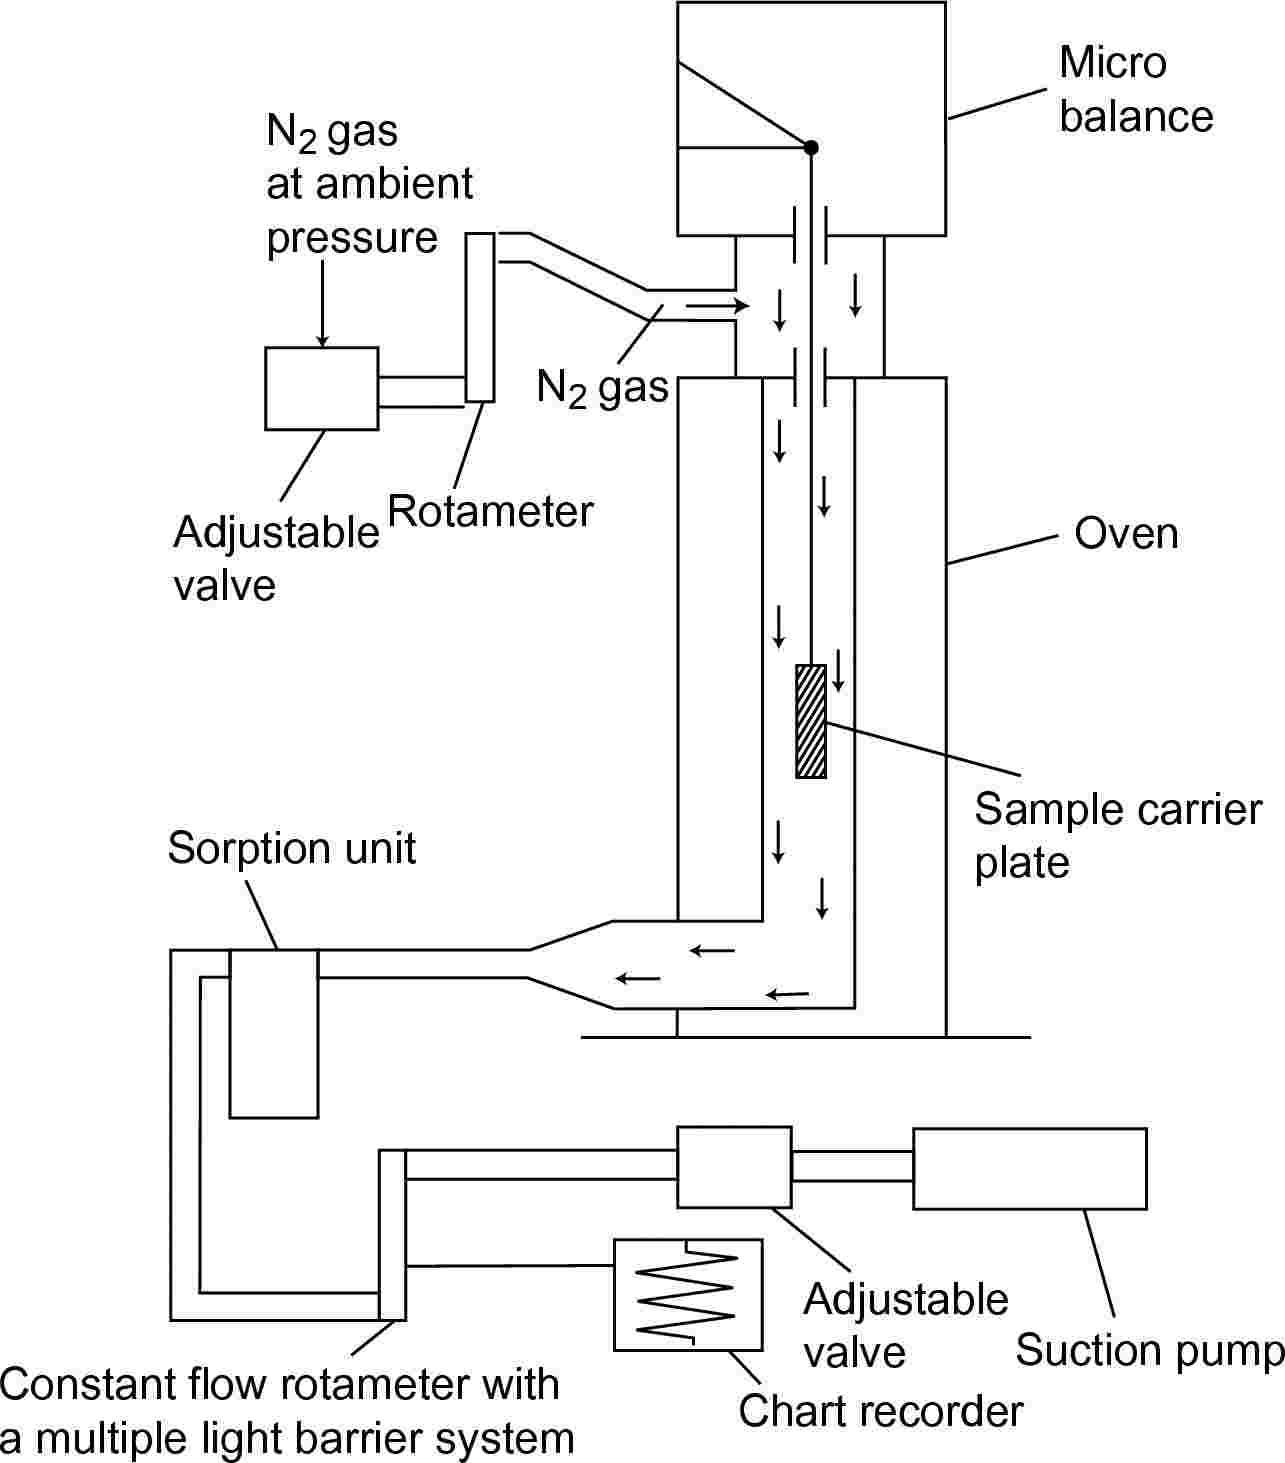 Eur Lex 02008r0440 20101212 En Besides Mini Split System Wiring Diagram Also Chamberlain Garage Door Image